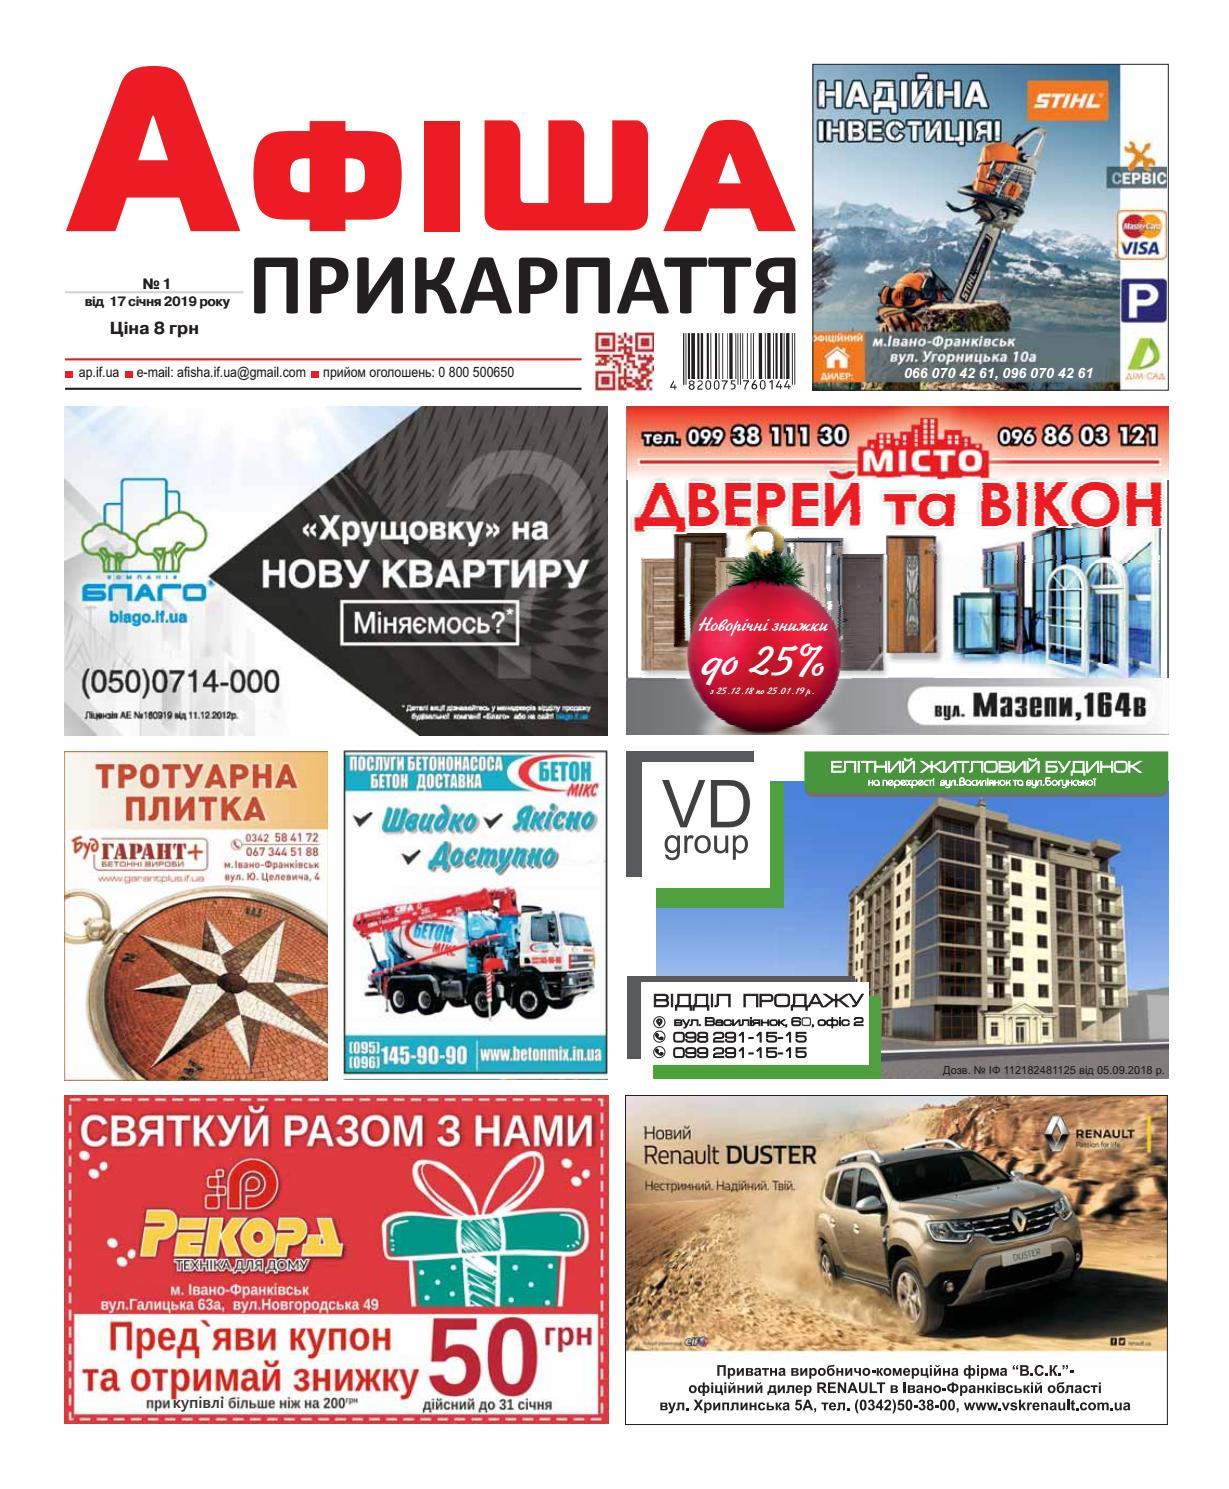 Афіша Прикарпаття №1 by Olya Olya - issuu 7b0b8bfdfcc6b